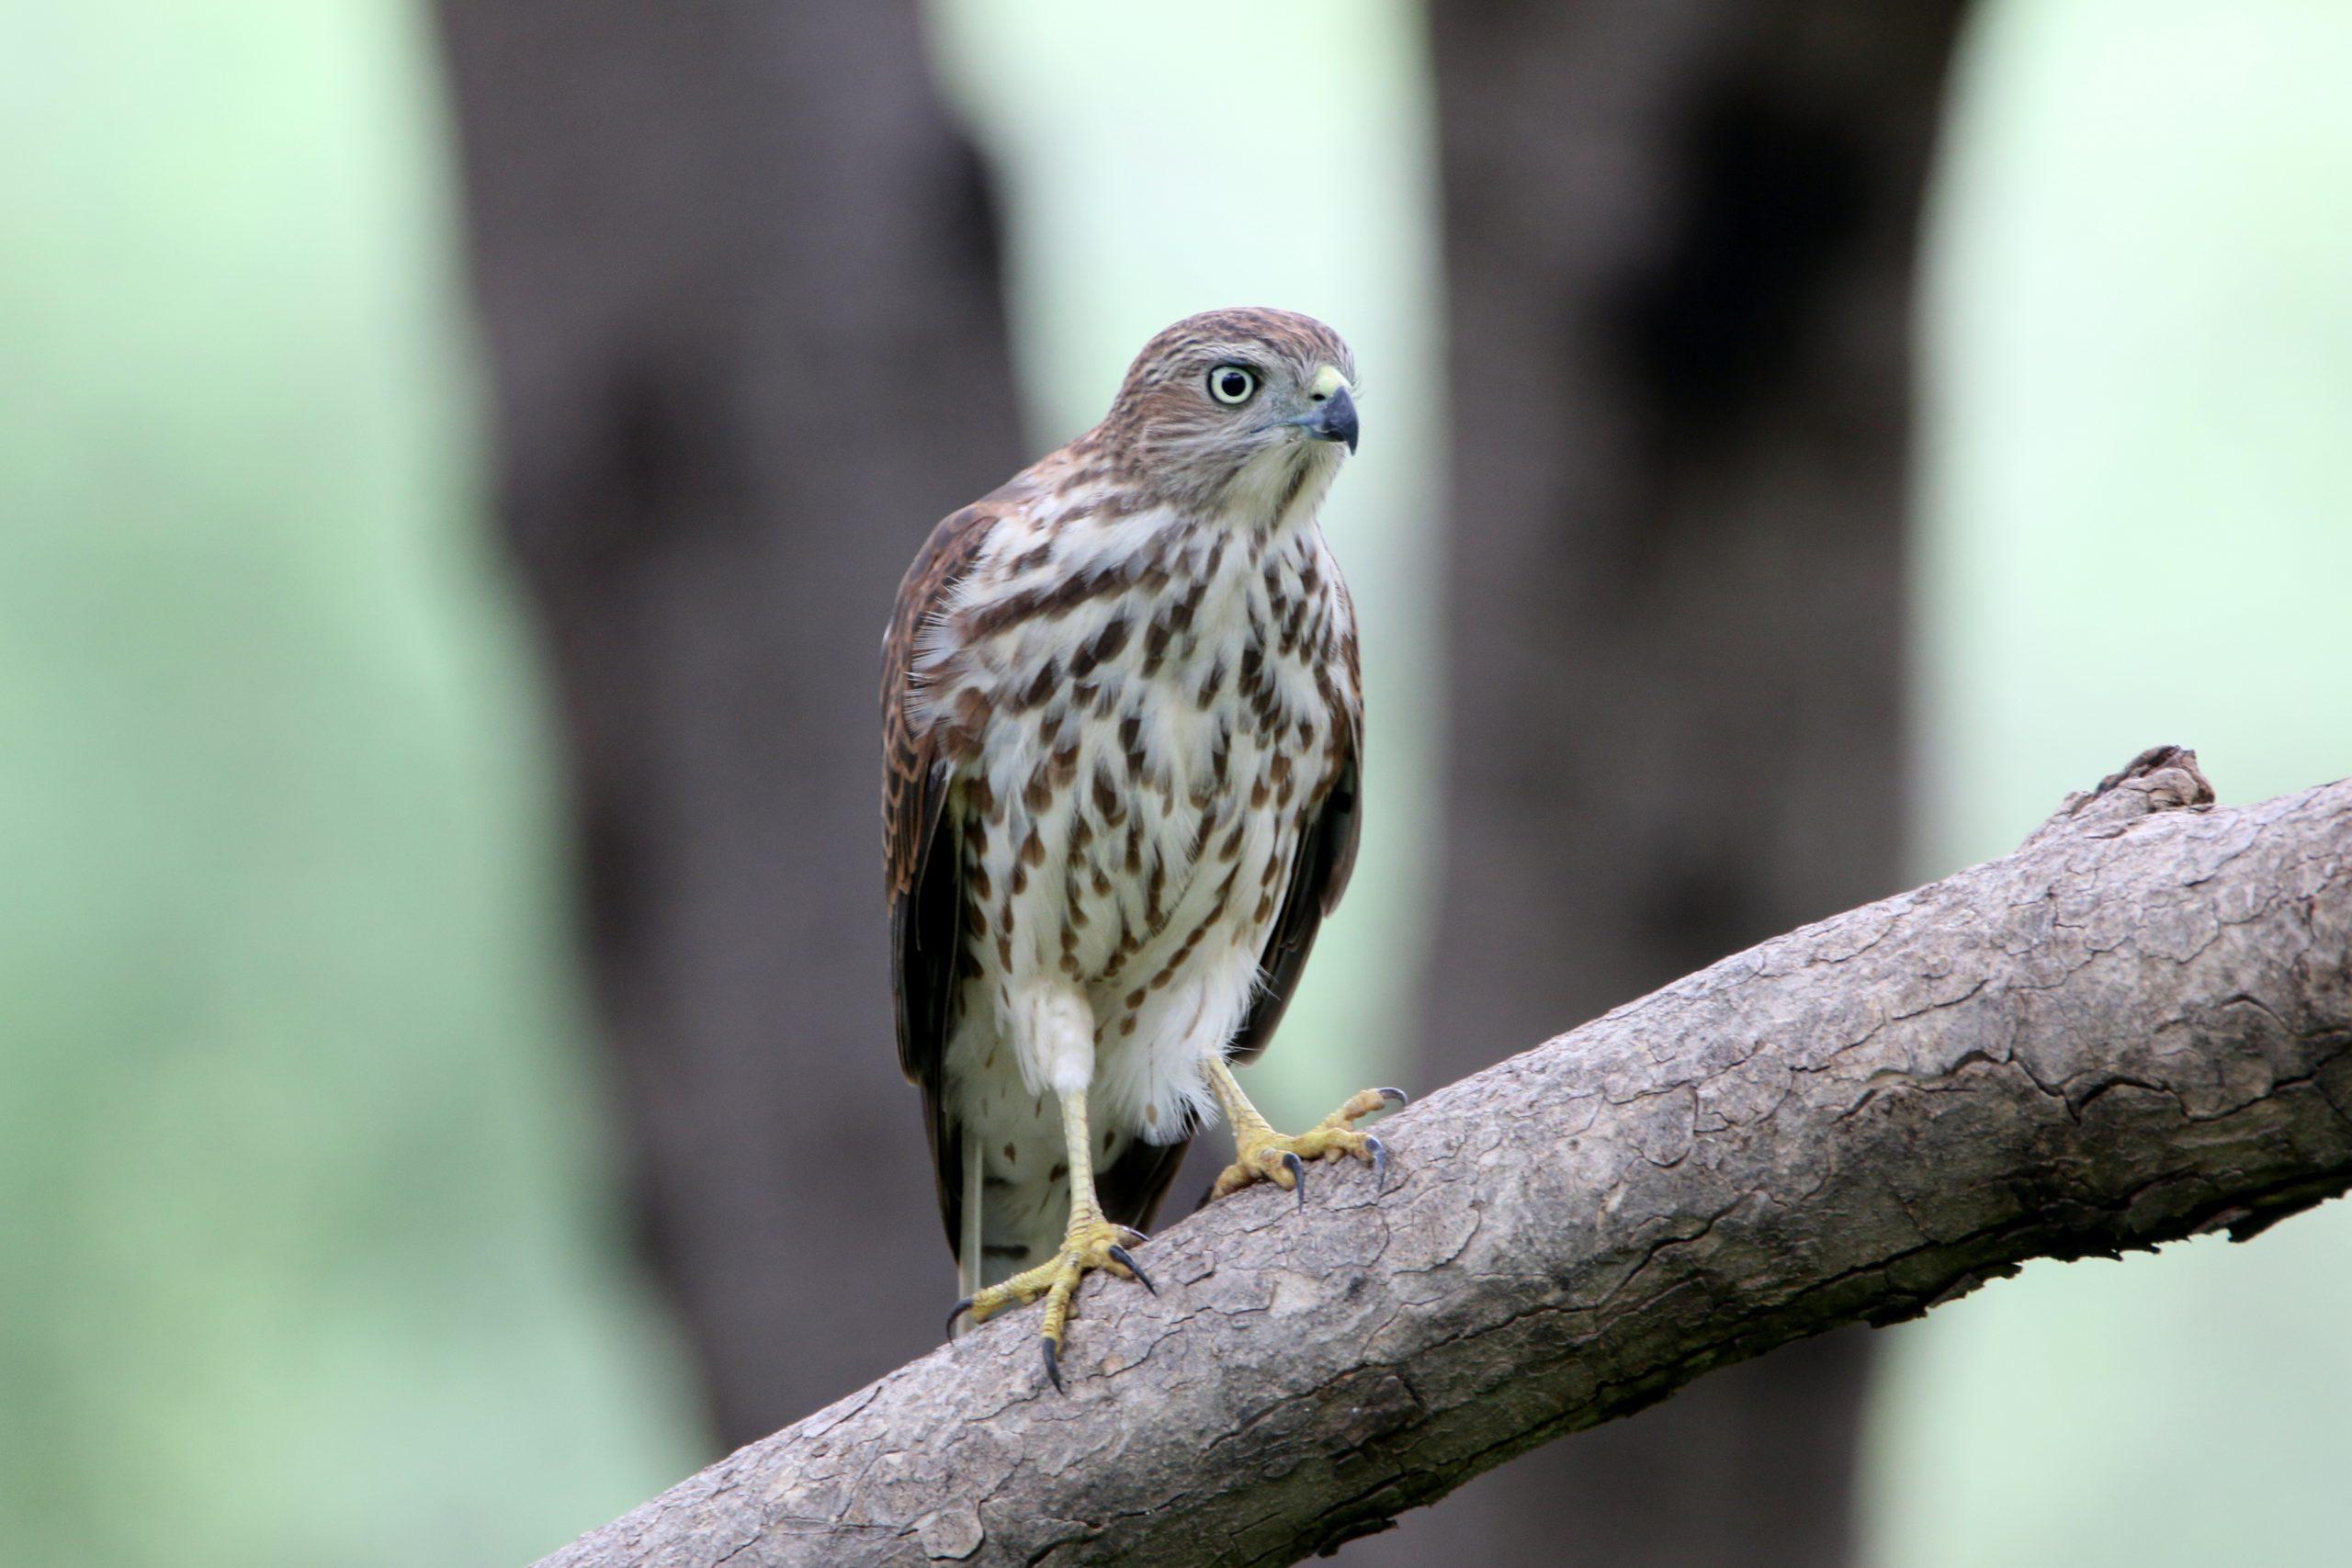 Shikra bird on a branch